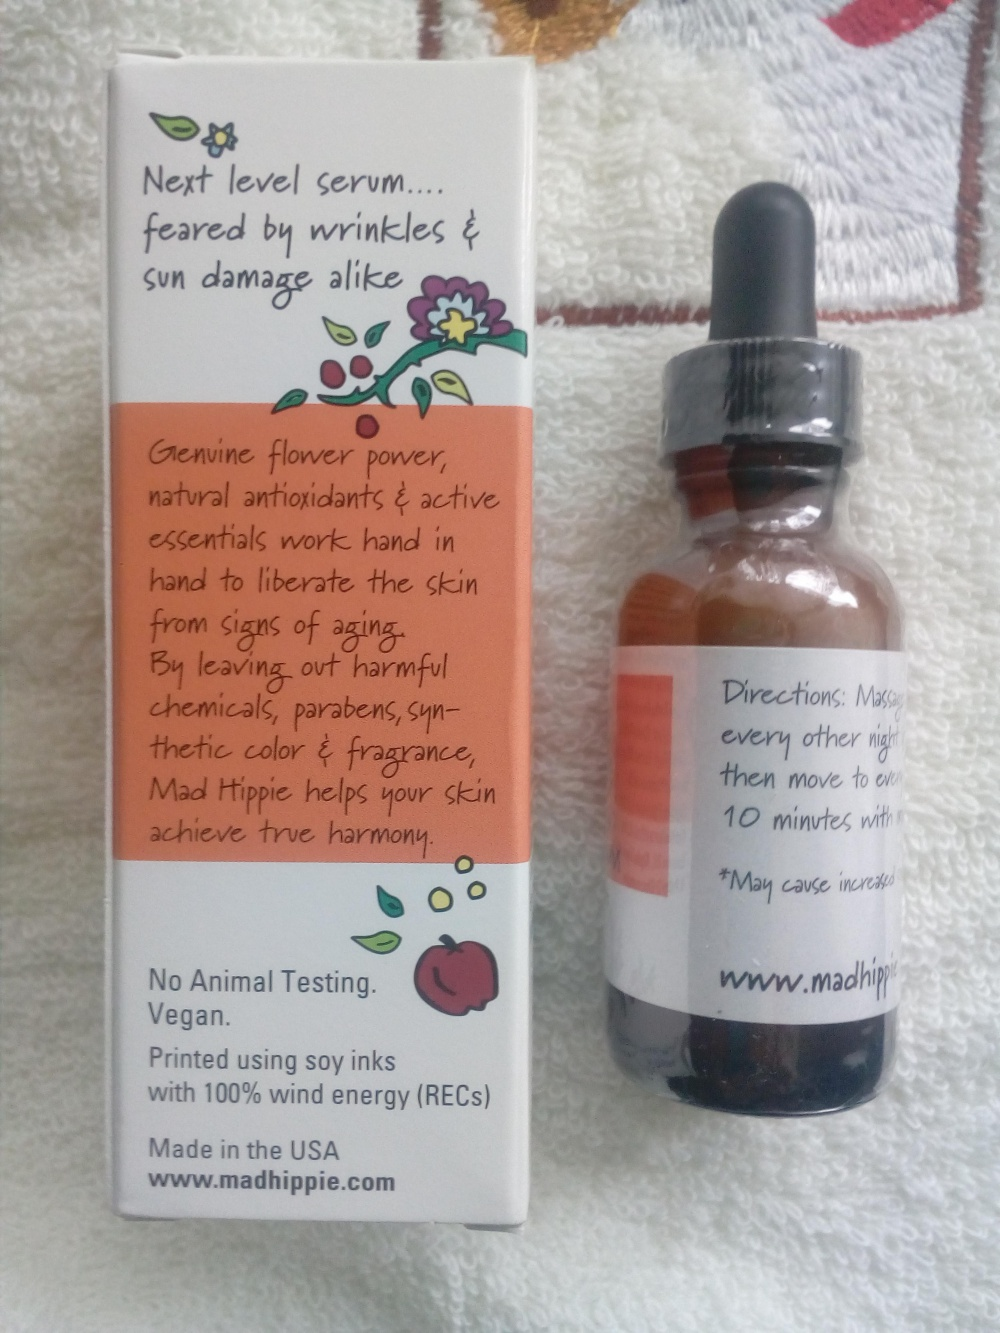 Mad Hippie Skin Care Products, Сыворотка с витамином A, 30мл.